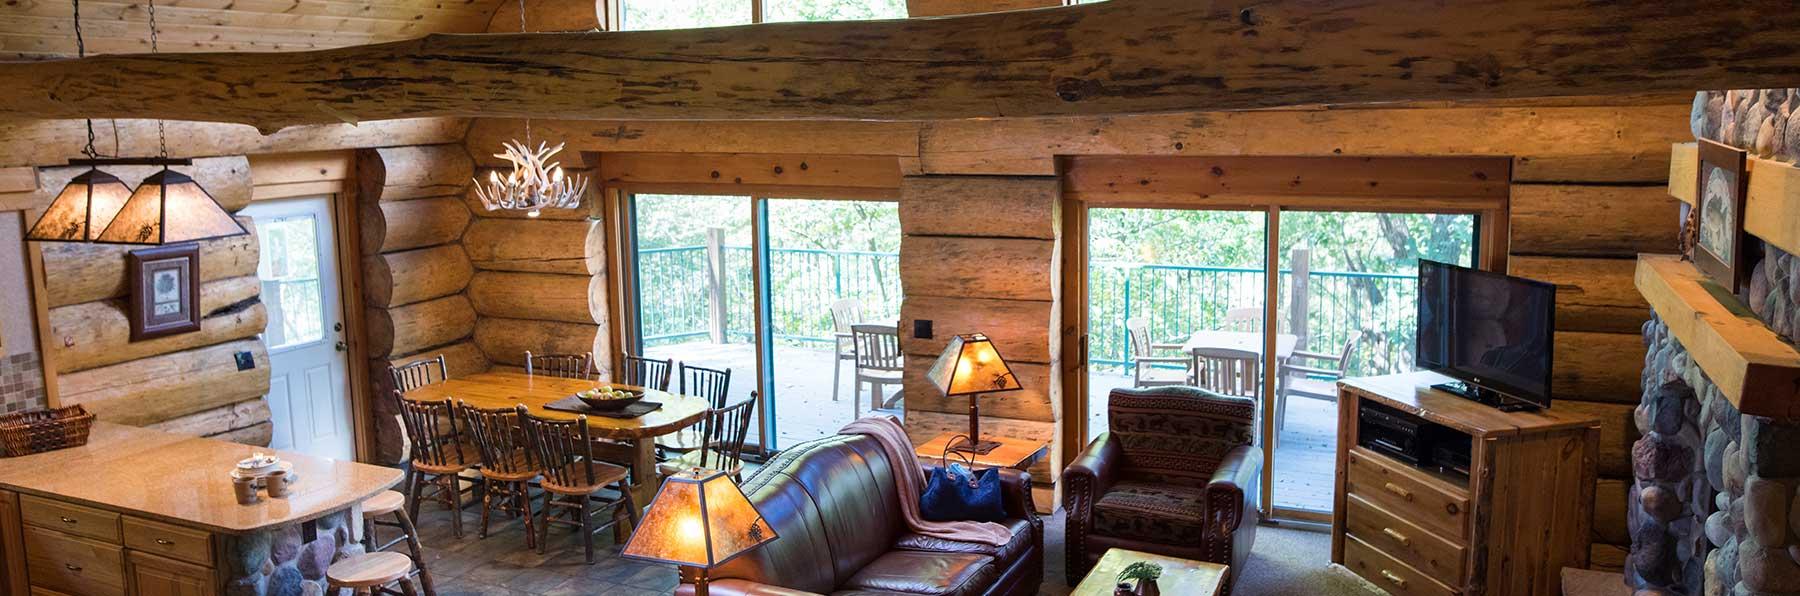 Peachy 5 Bedroom Retreat Cabin Wilderness Resort Wisconsin Dells Beutiful Home Inspiration Aditmahrainfo